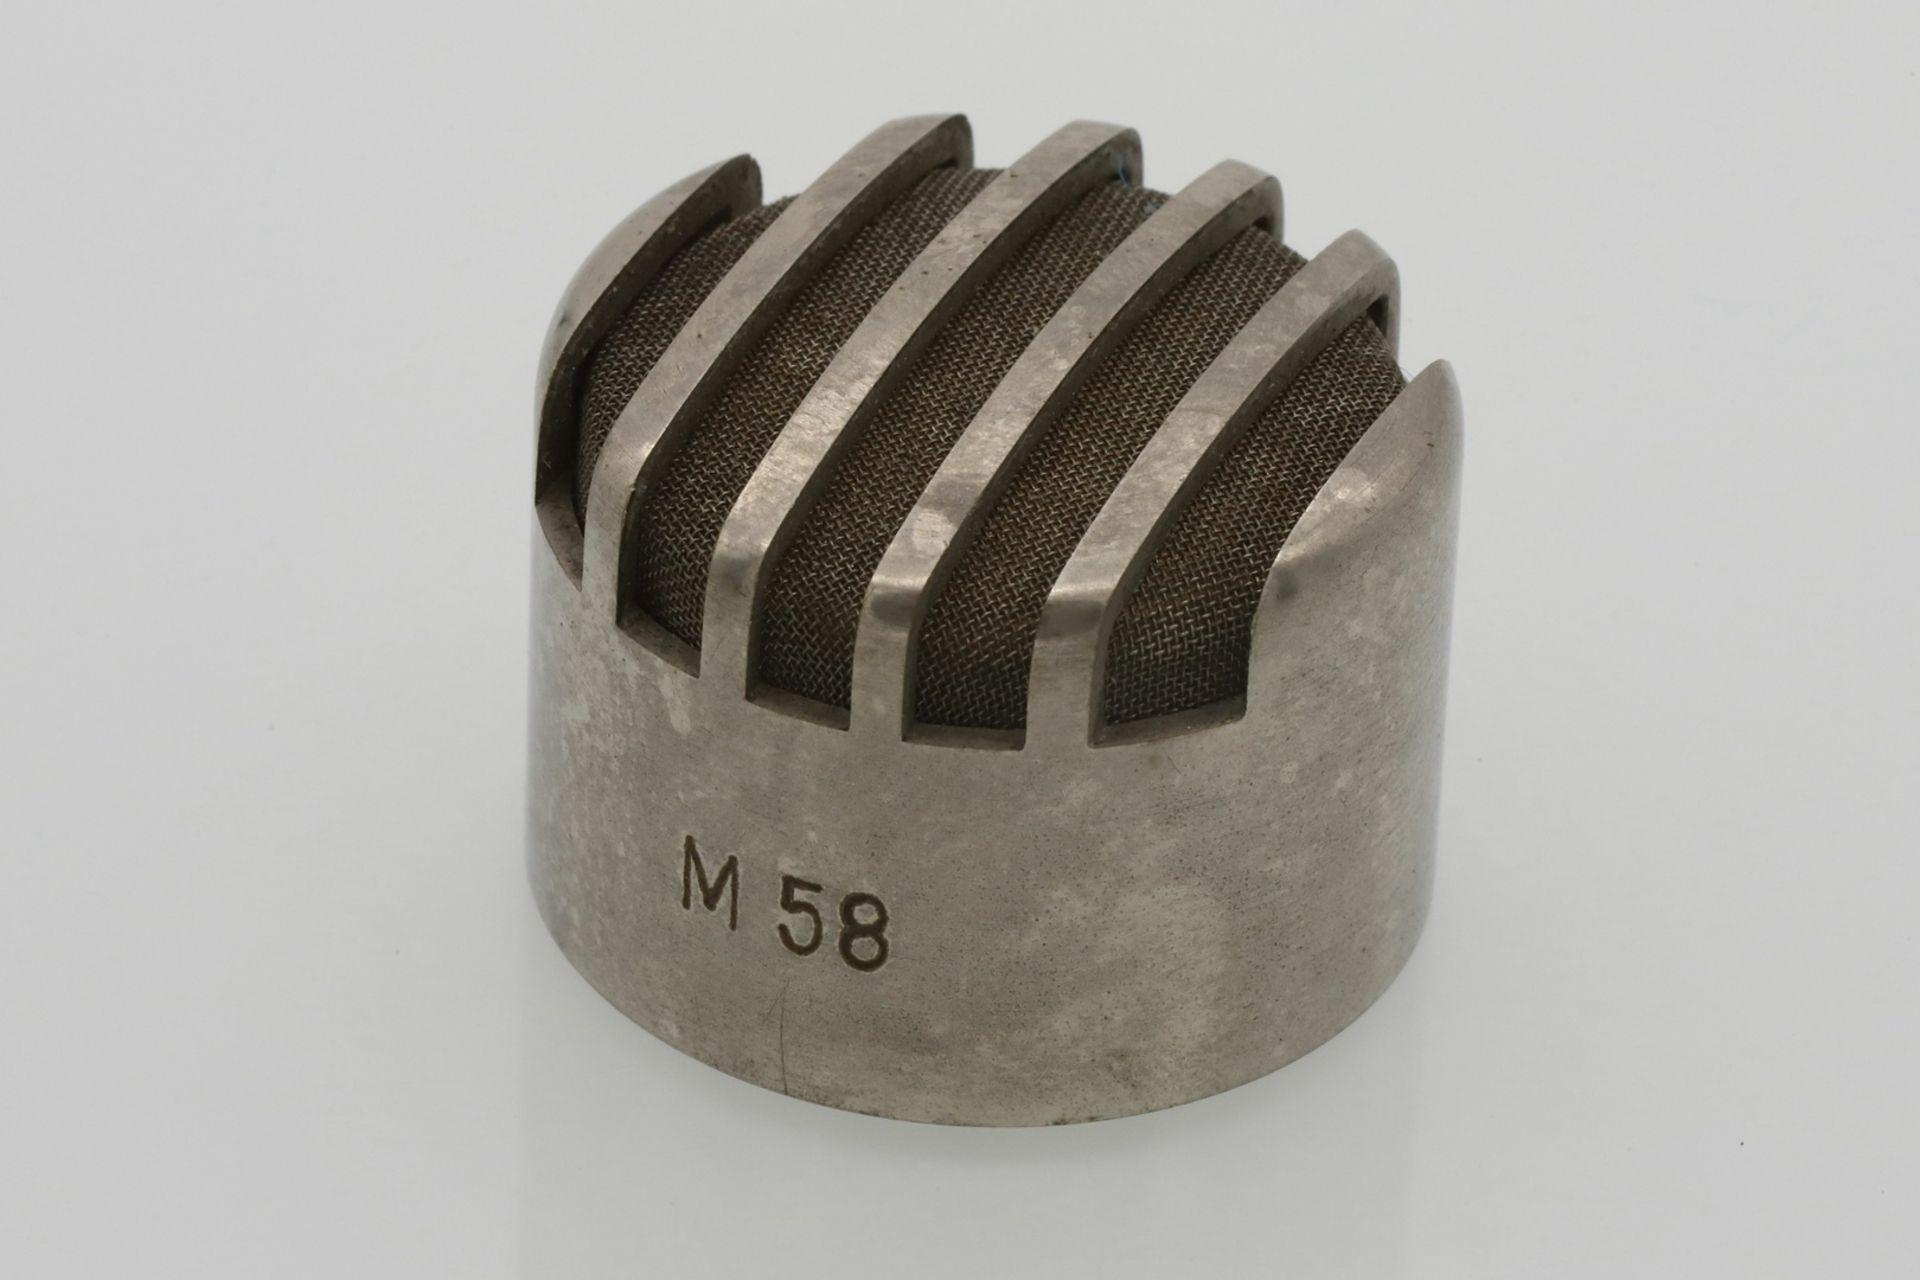 Neumann Kondensatormikrofonkapsel M58, um 1960 - Bild 2 aus 5